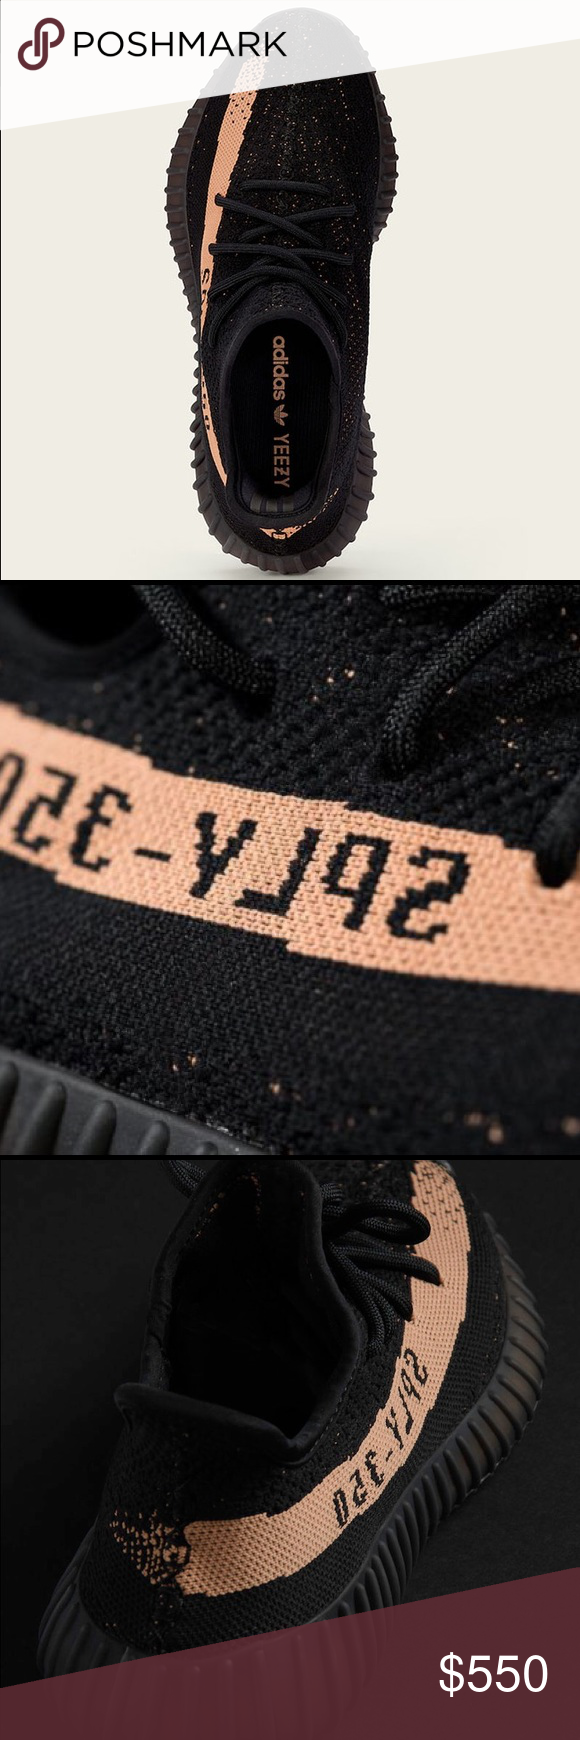 Adidas Yeezy Adidas Boost 30 v2   Yeezy boost, Adidas Yeezy Zapatos and Adidas eff092